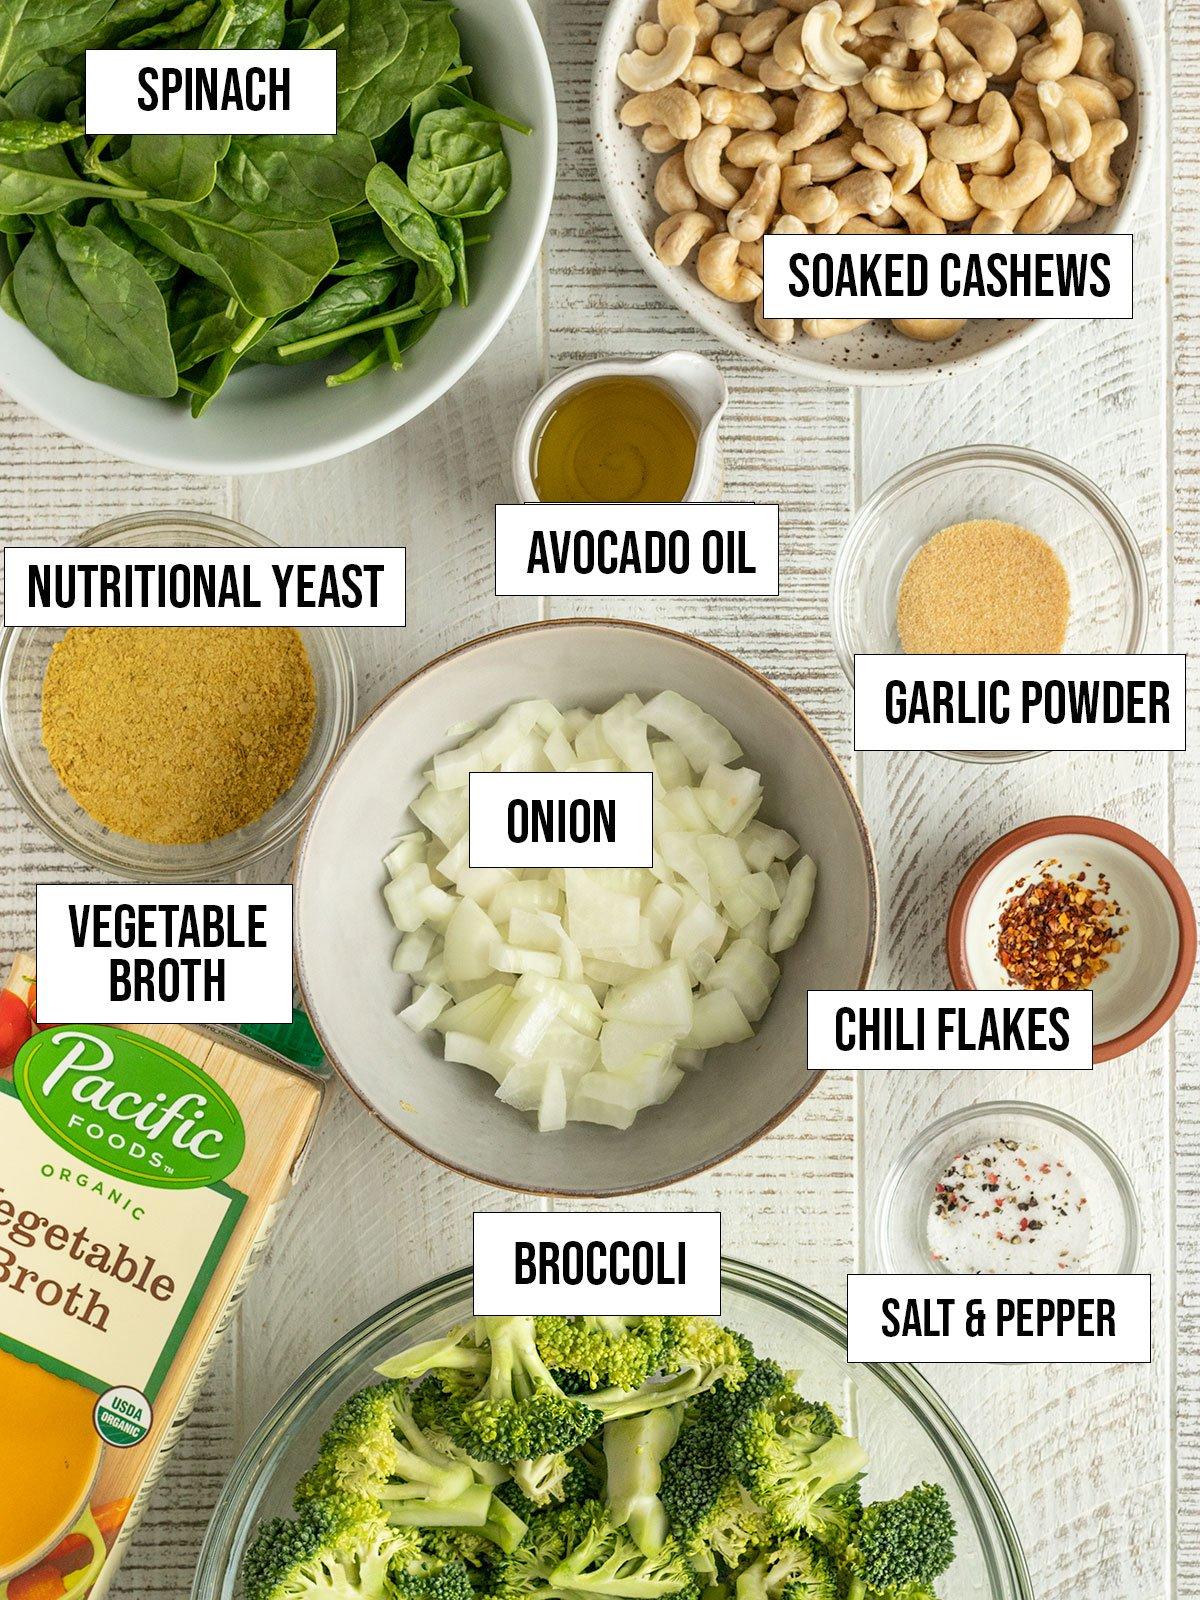 ingredients like broccoli, spinach, vegetable broth, onion, cashews, nutritional yeast, garlic powder, salt, chili flakes